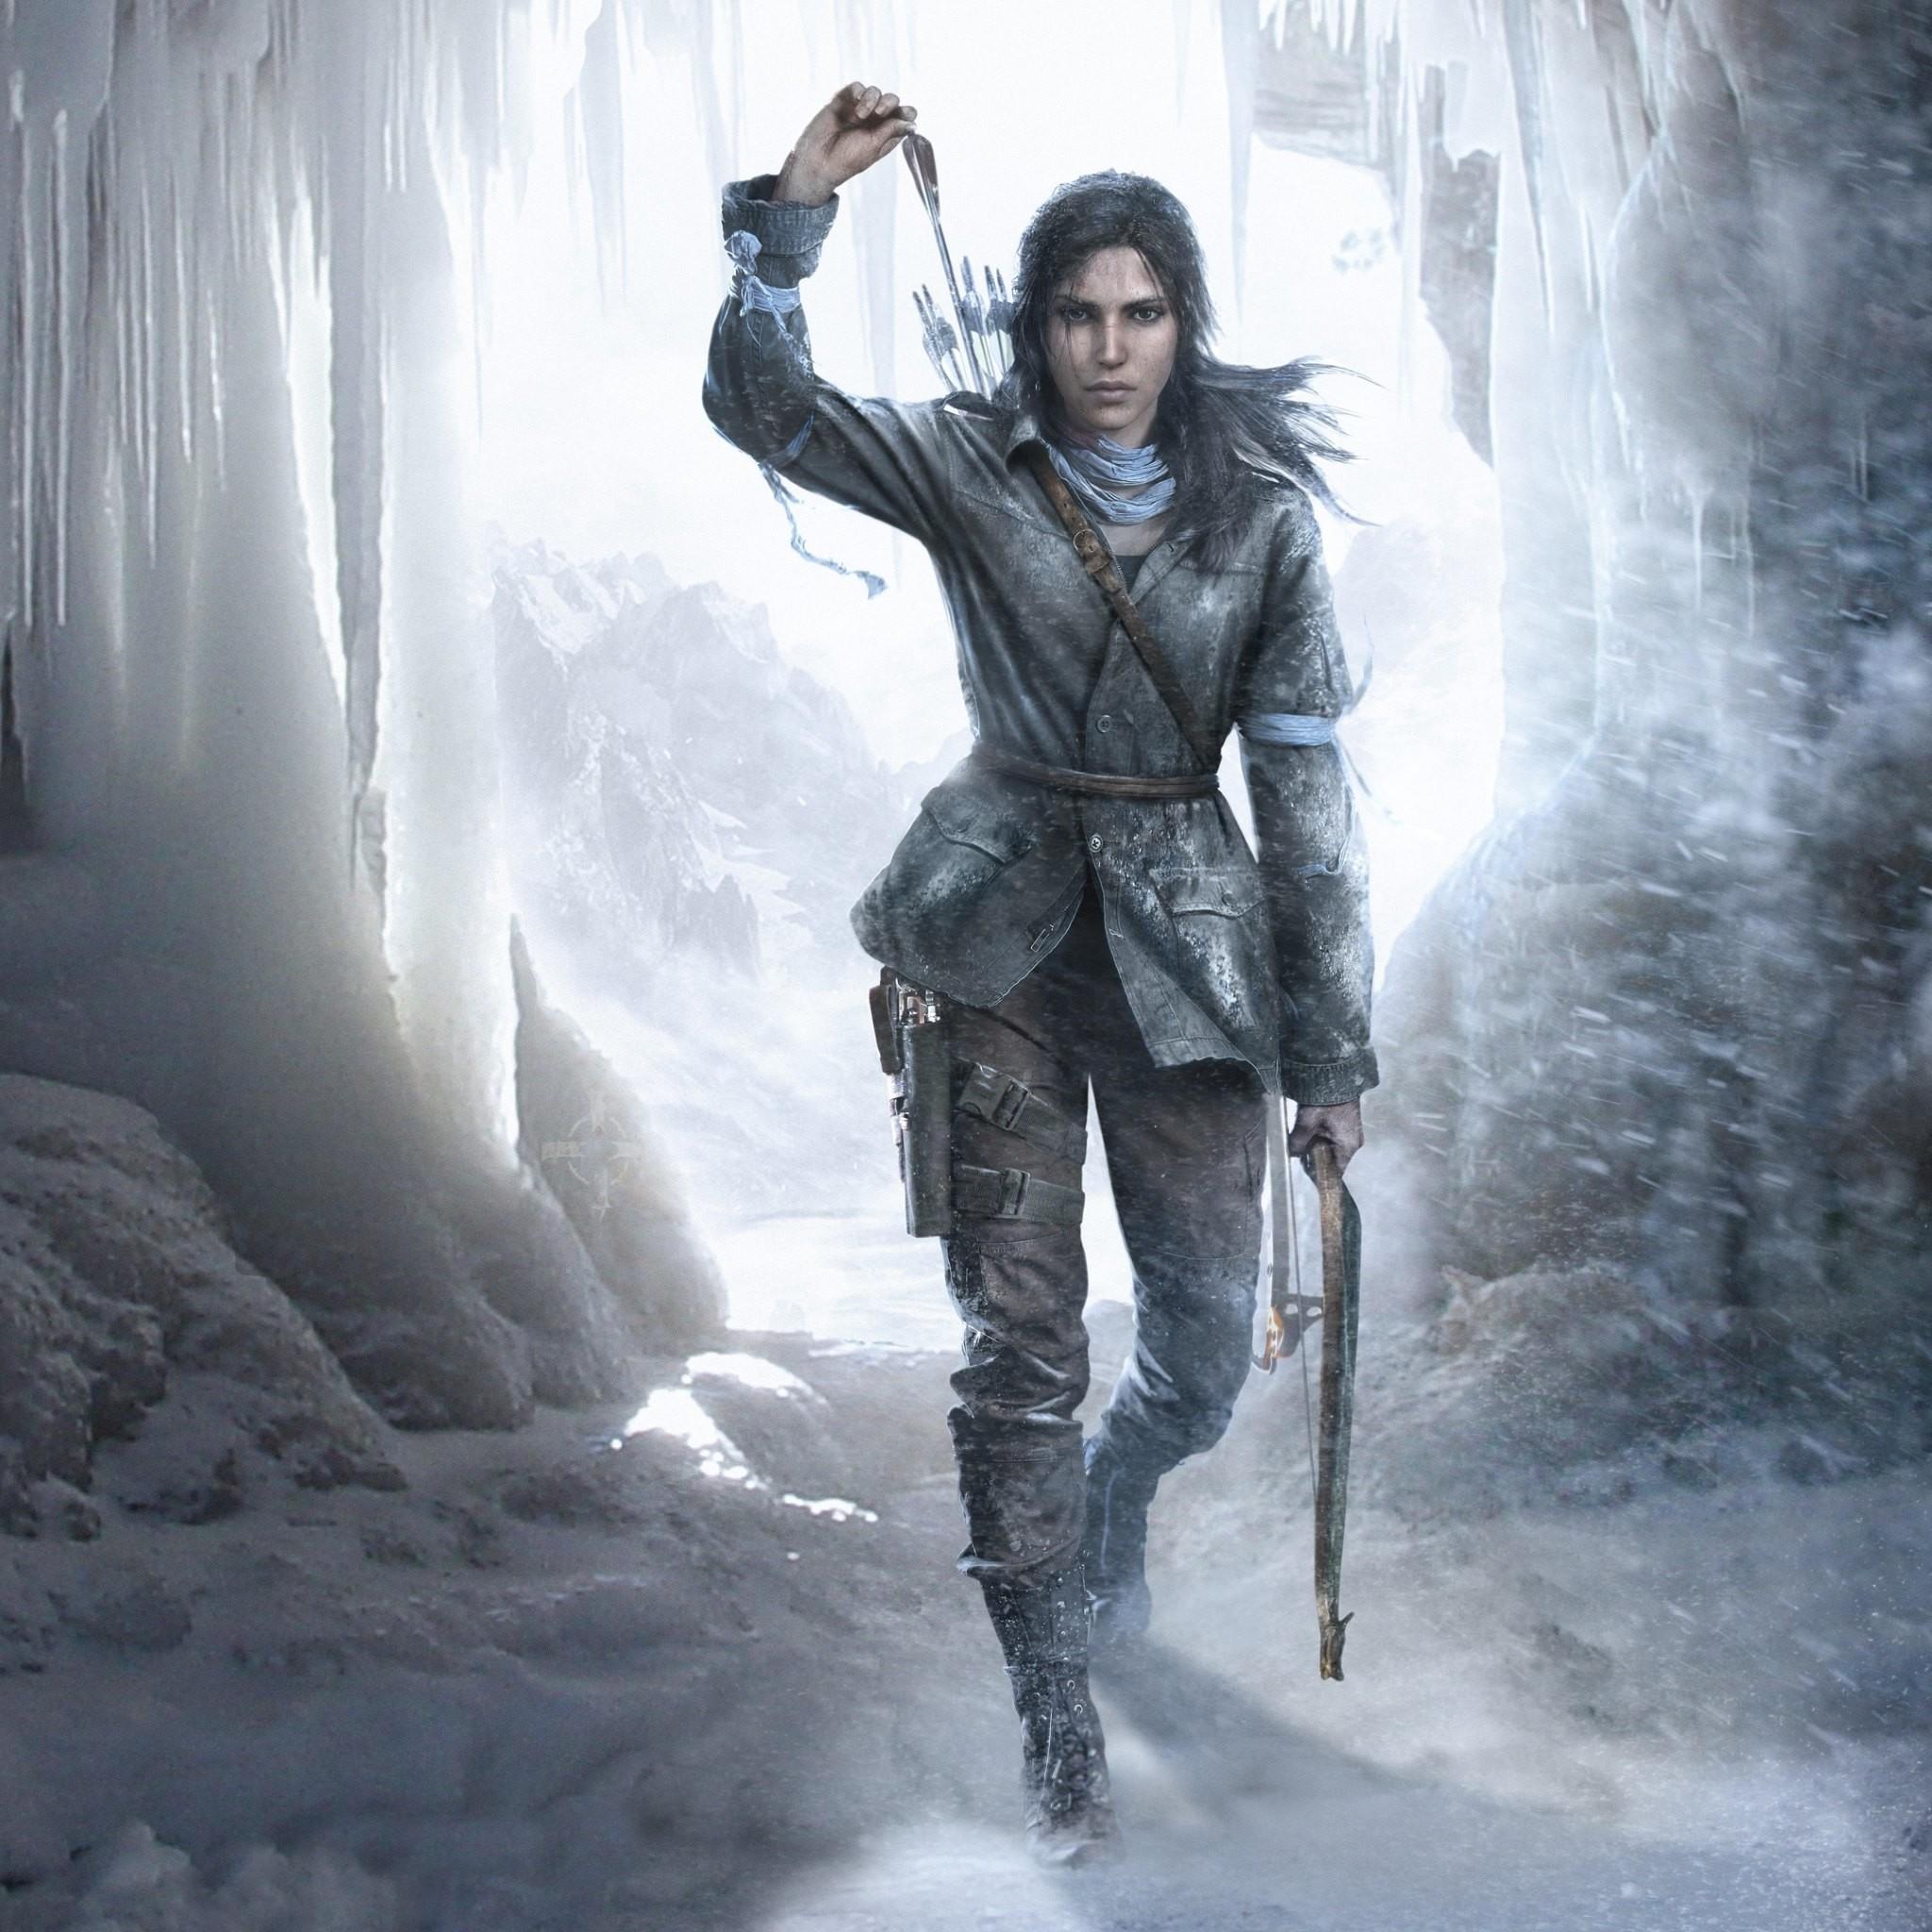 Art Lara Croft Shadow Of The Tomb Raider Desktop Wallpapers: Tomb Raider 2018 Android Wallpaper ·① WallpaperTag